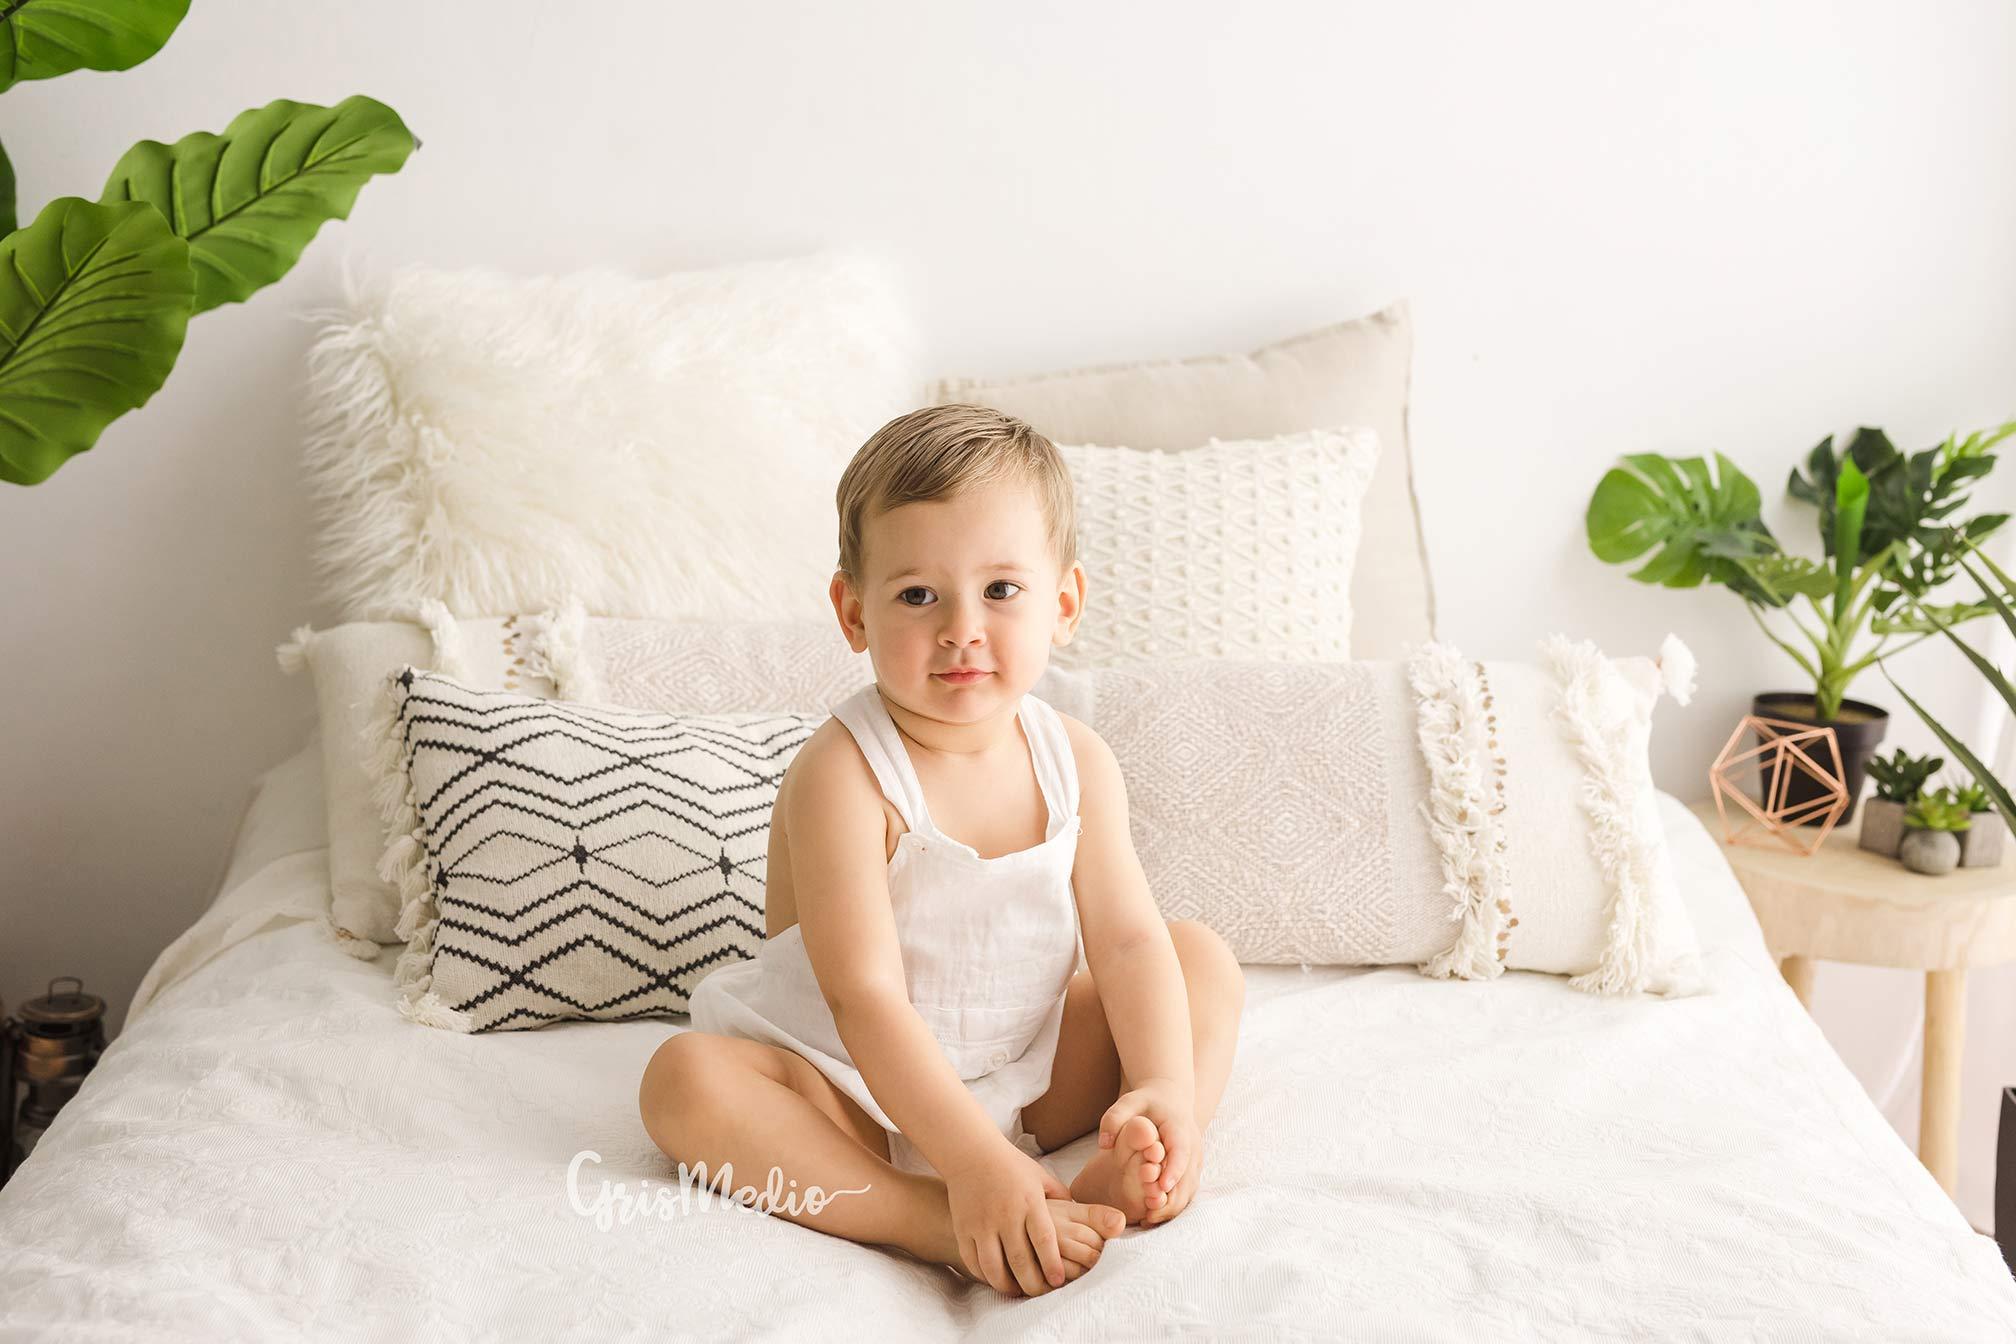 fotografia-familia-infantil-zaragoza-grismedio-bebe-lactancia17